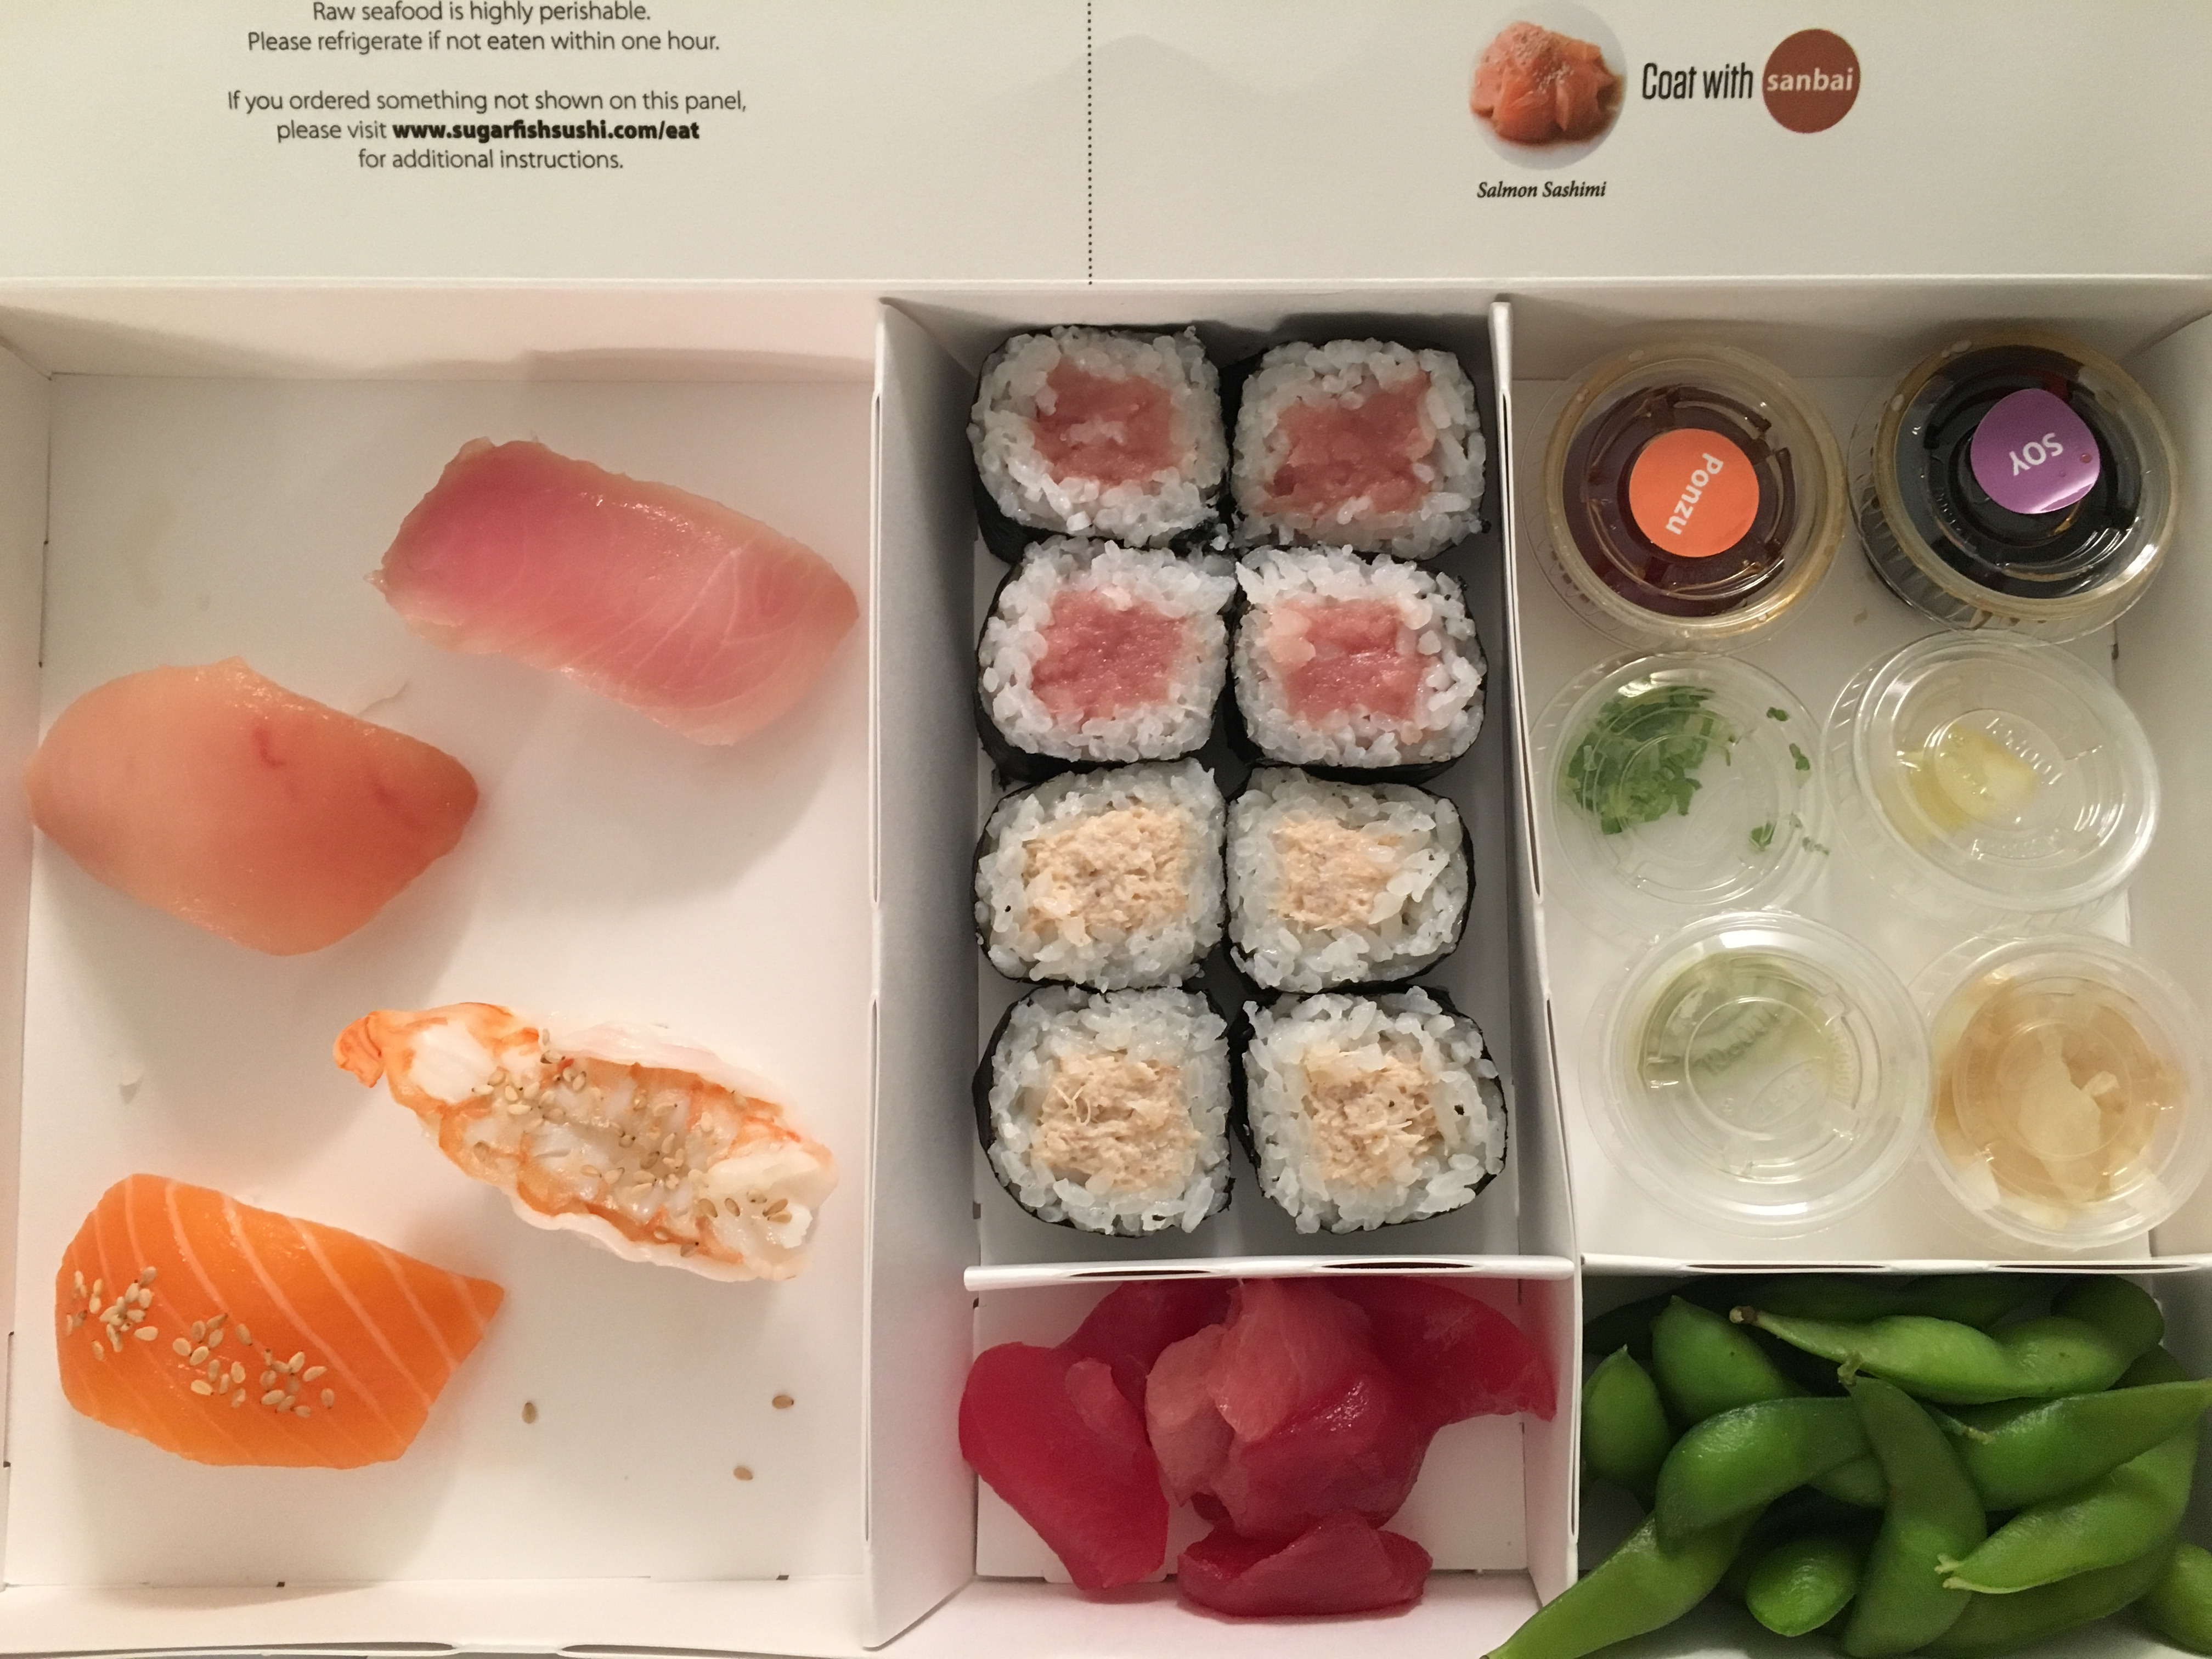 A Sugarfish delivery order